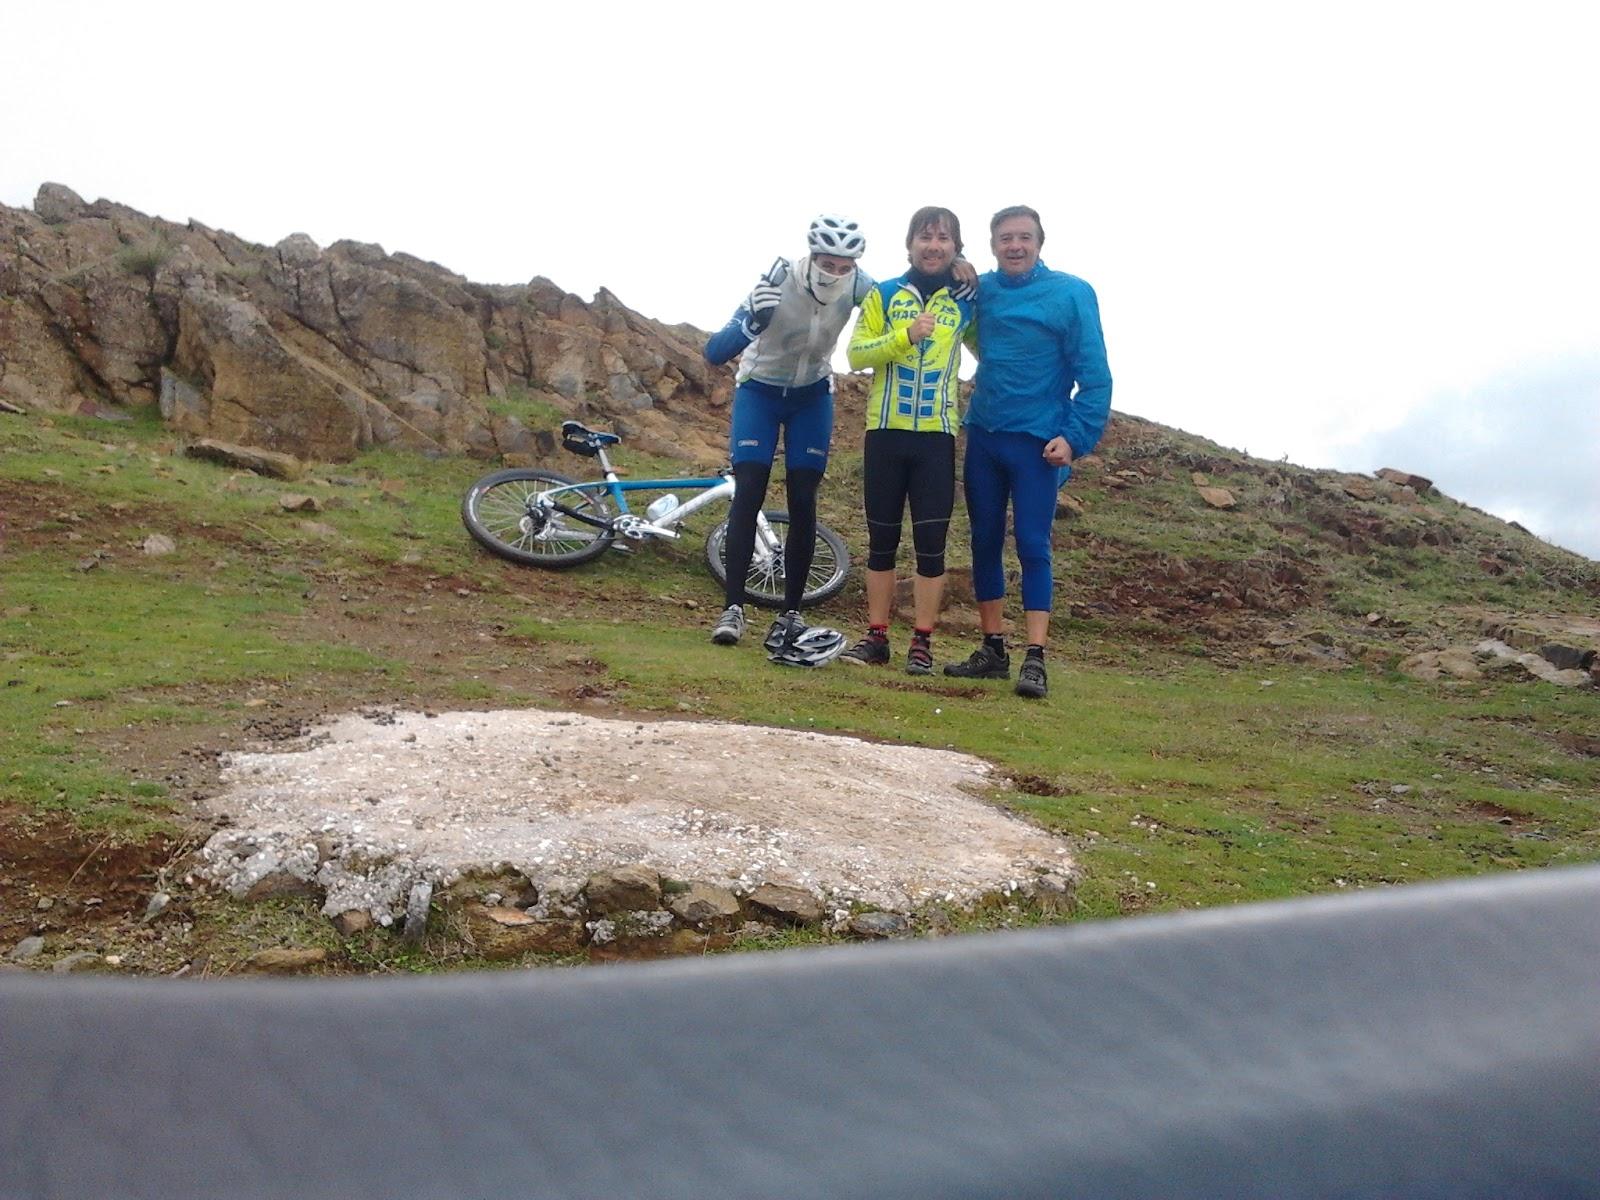 Cd cicloturista la vereita noviembre 2011 for Caseta guarda bicicletas